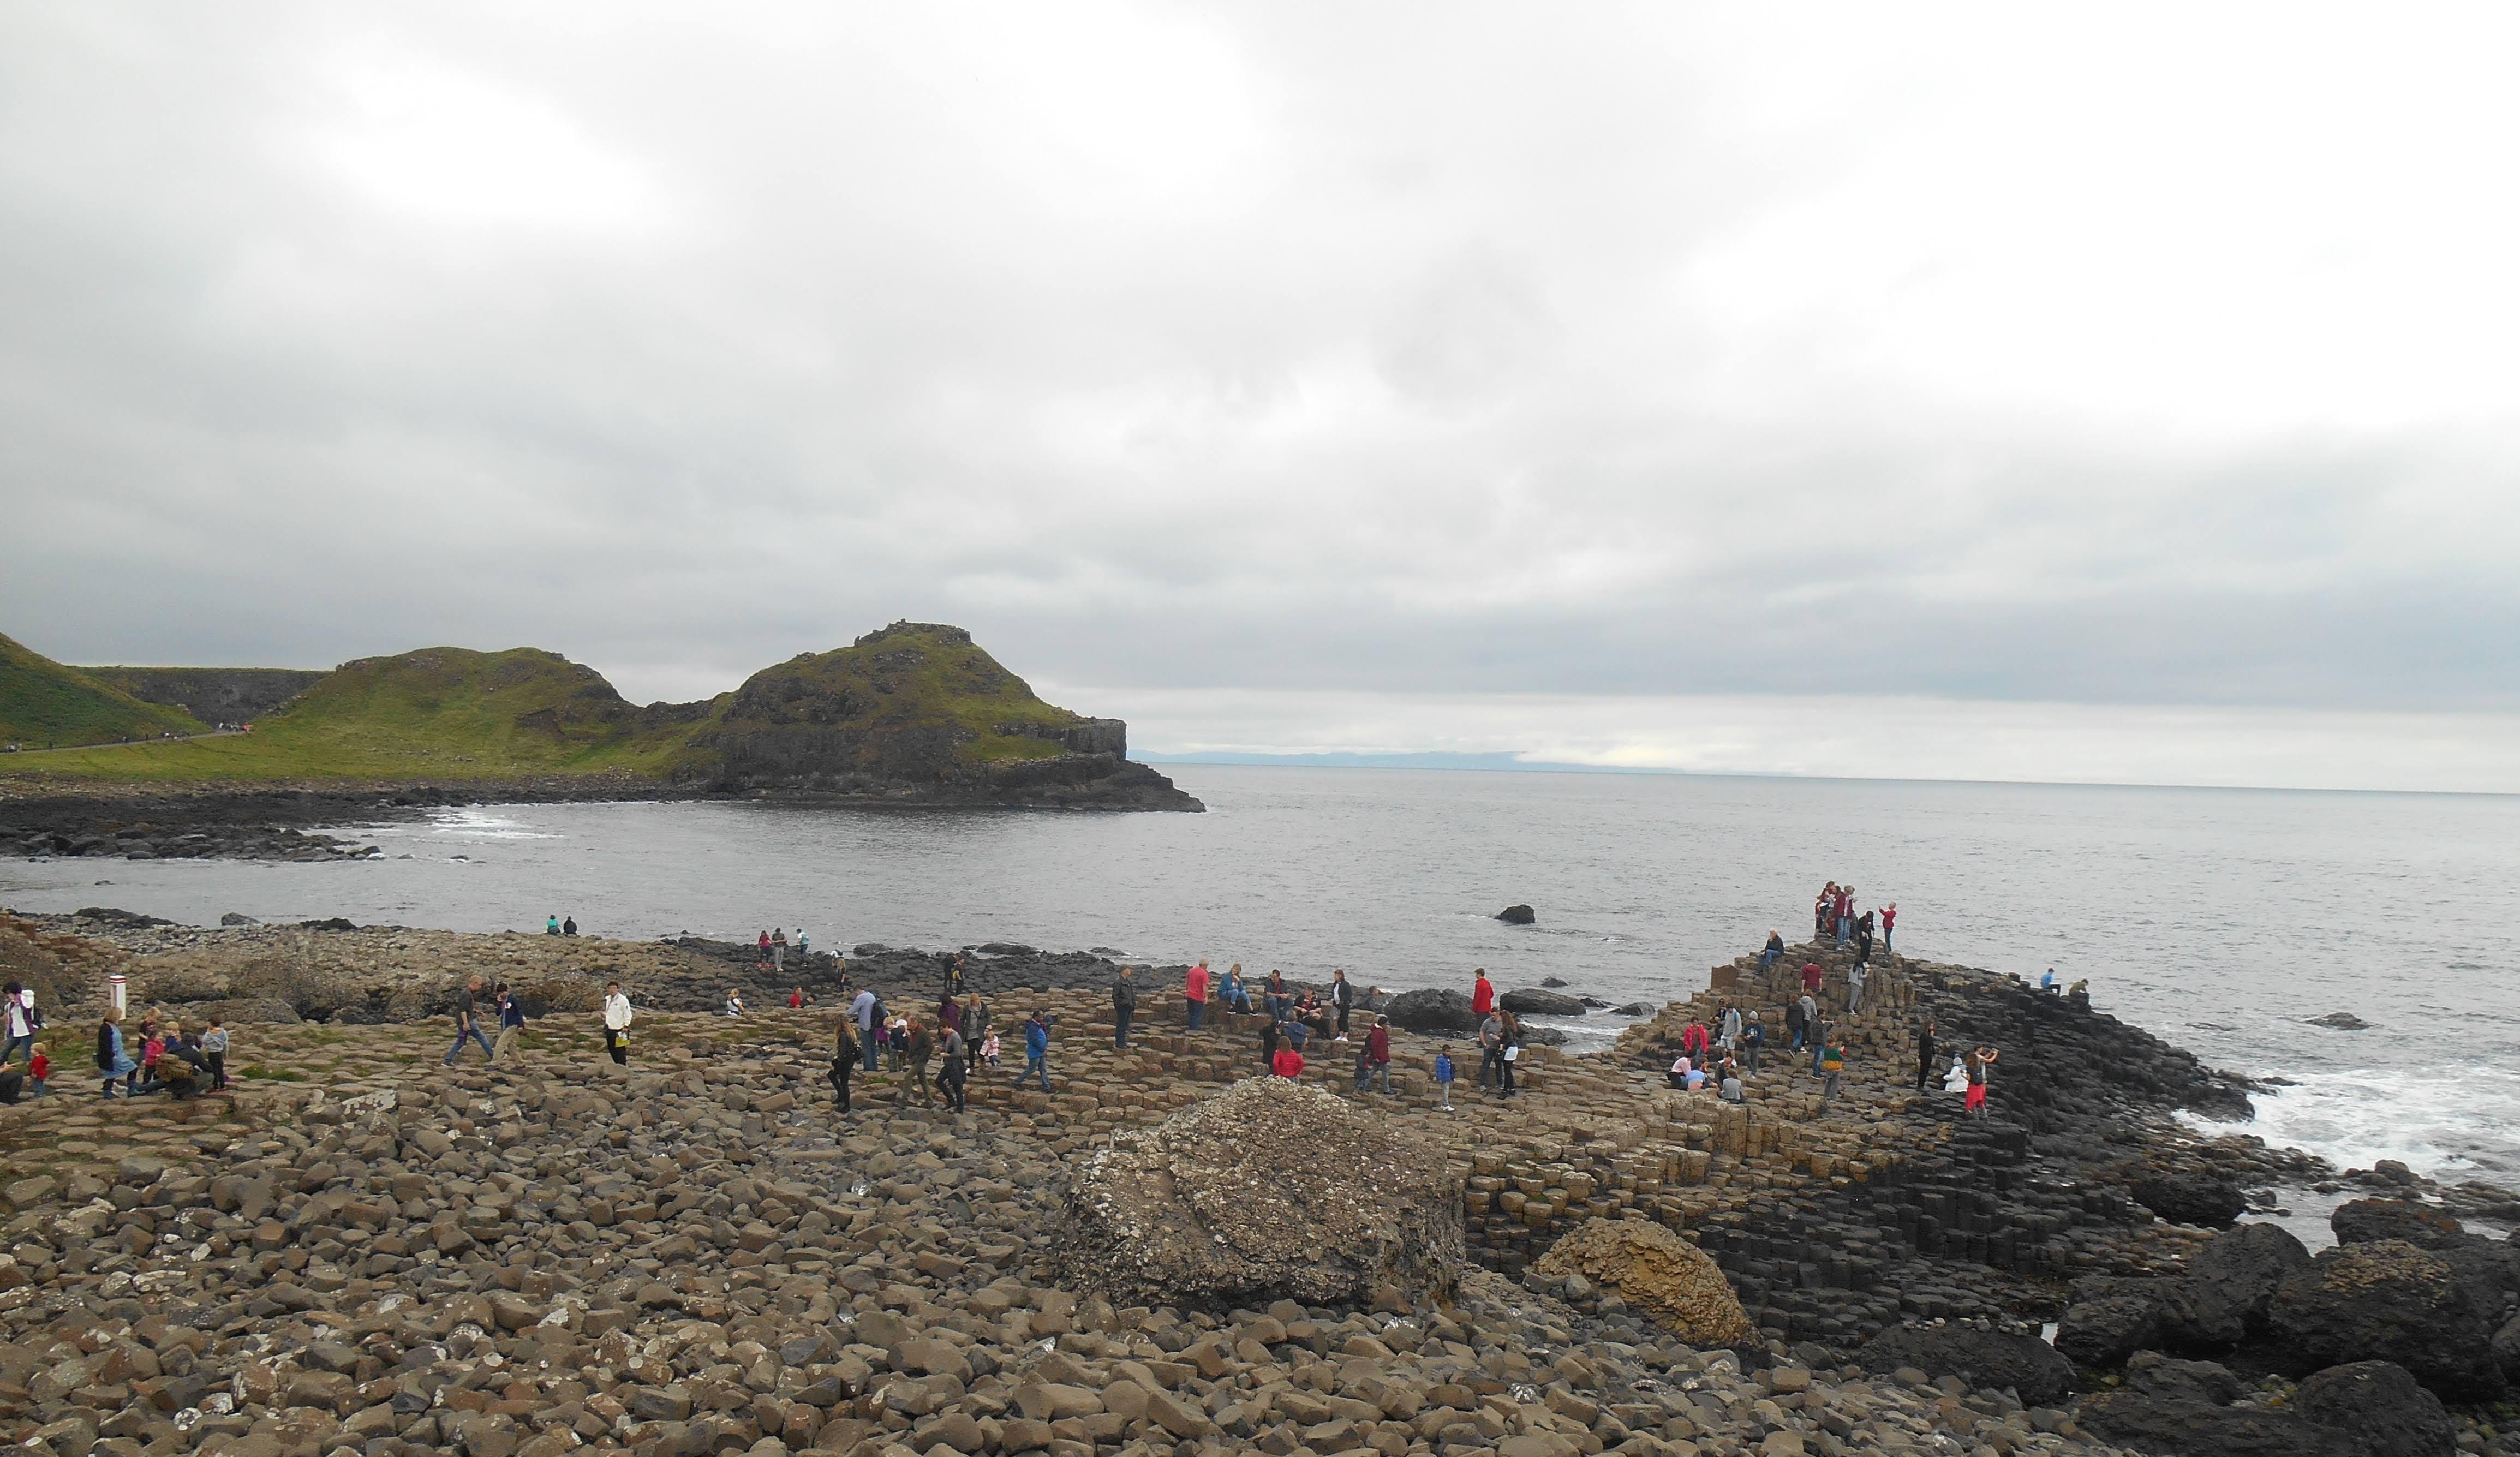 calzada-del-gigante-finn-mccool-leyendas-mitos-geologia-naturaleza-paisajes-viajes-irlanda-del-norte-gigantes-columnas-basalticas-basalto-erosion-volvanes-dark-hedges-fantasma-spire-dublin-daniel-o'connell-jim-lakin-william-smith-o'brien-juego-de-tronos-historia-carrick-a-rede-castillo-dunluce-celtas-gaelicos-fionn-mac-cumhaill-sorely-boy-mcconnell-isabel-felipe-catolicismo-protestantismo-religion